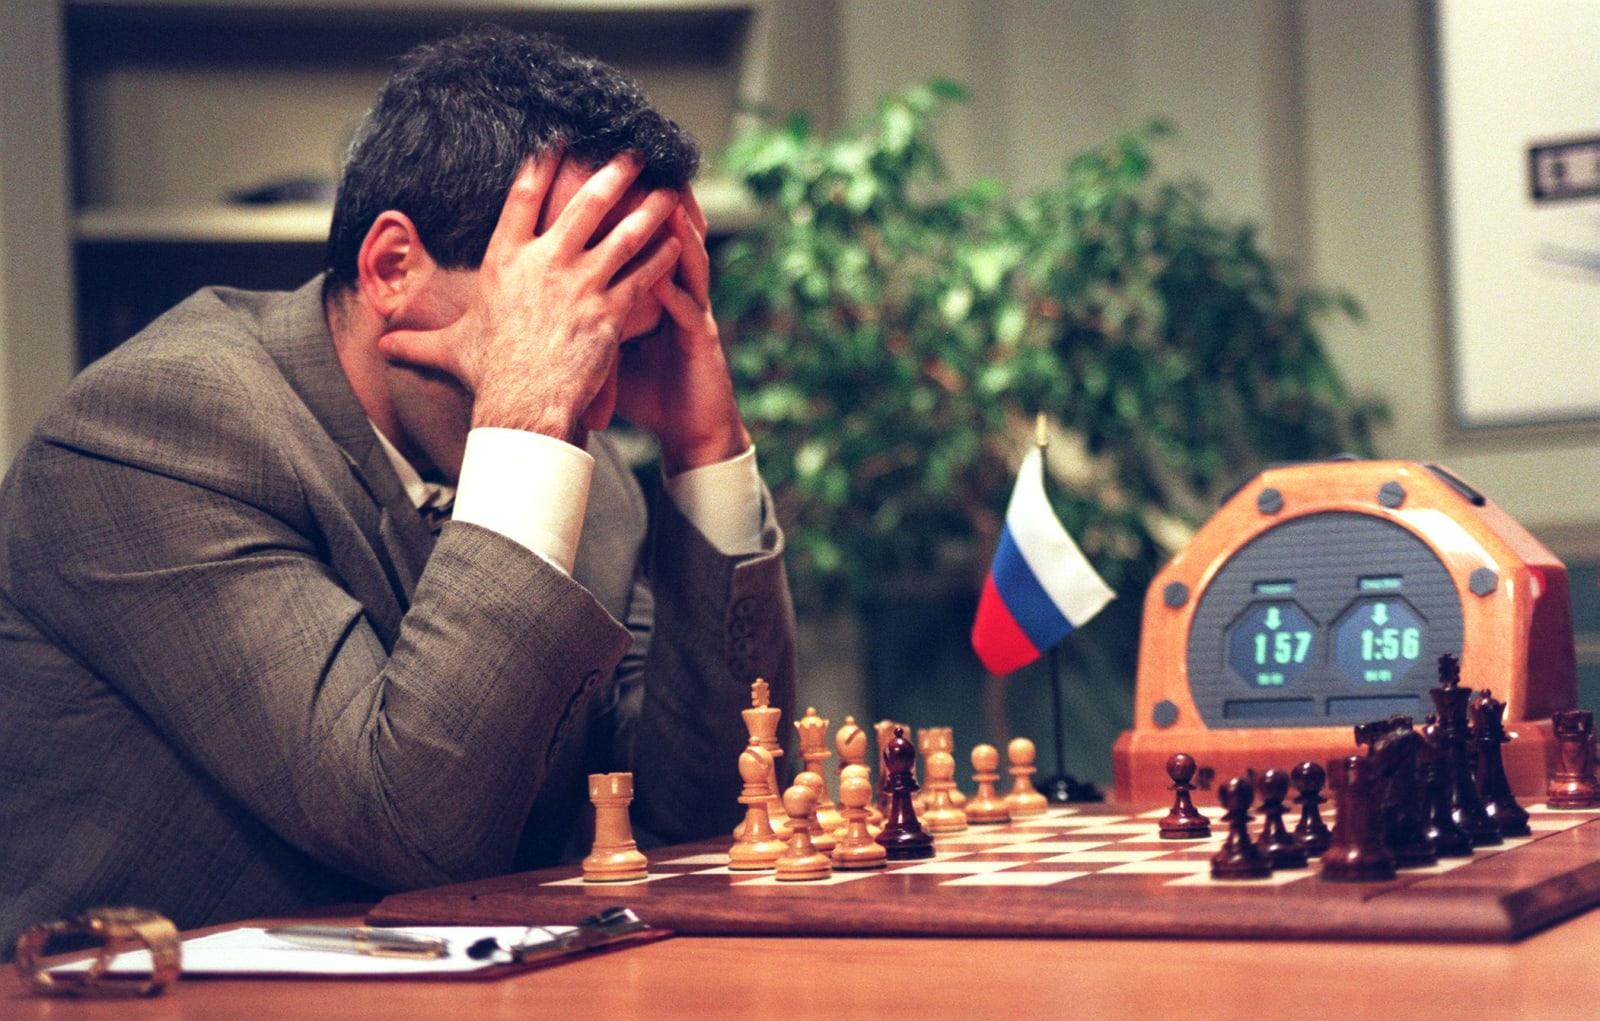 World Chess Champion Garry Kasparov looks at the c